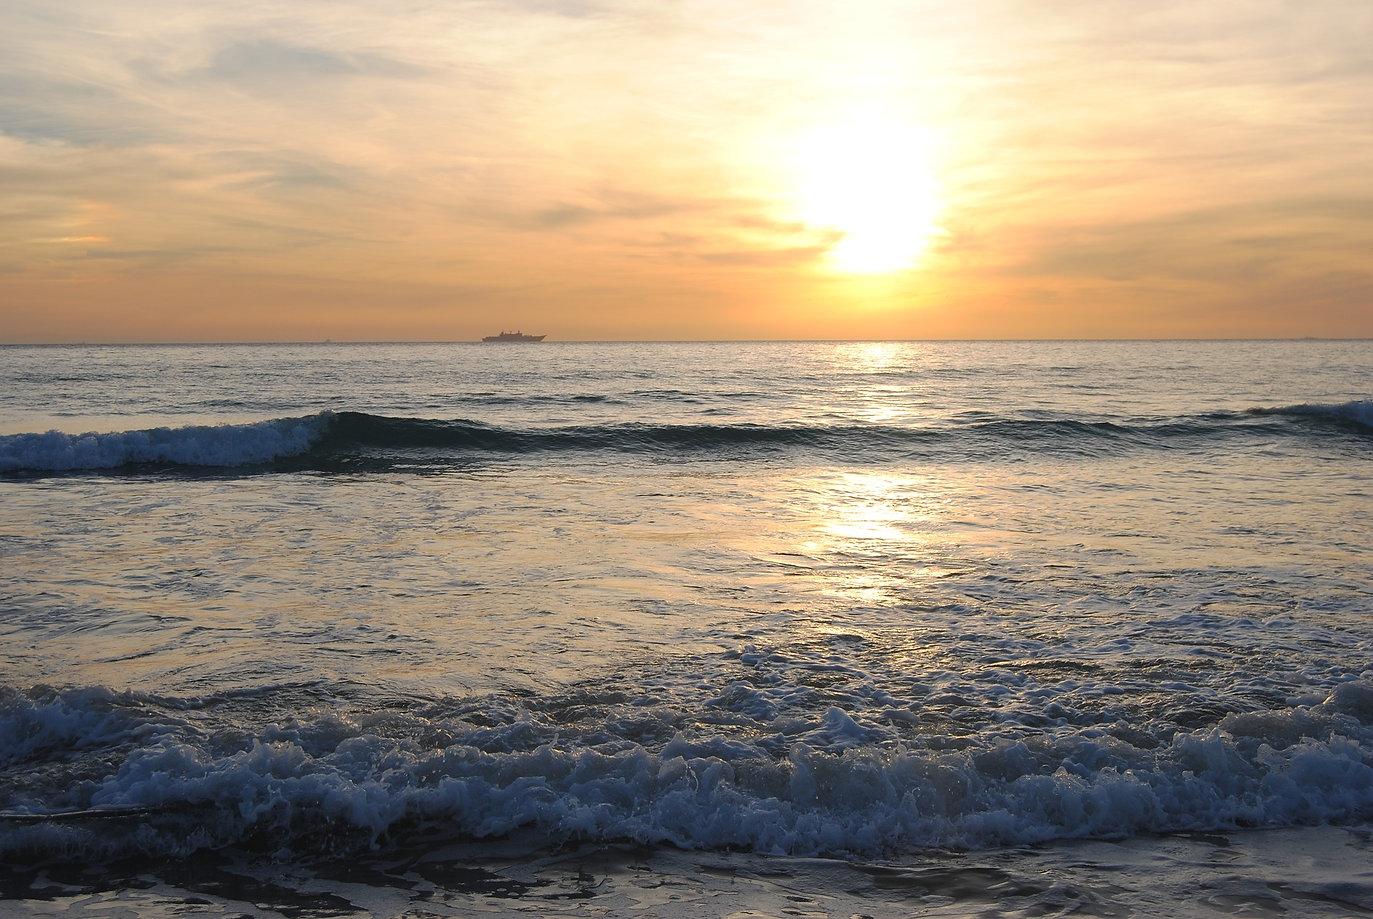 sunset-1914607_1920.jpg